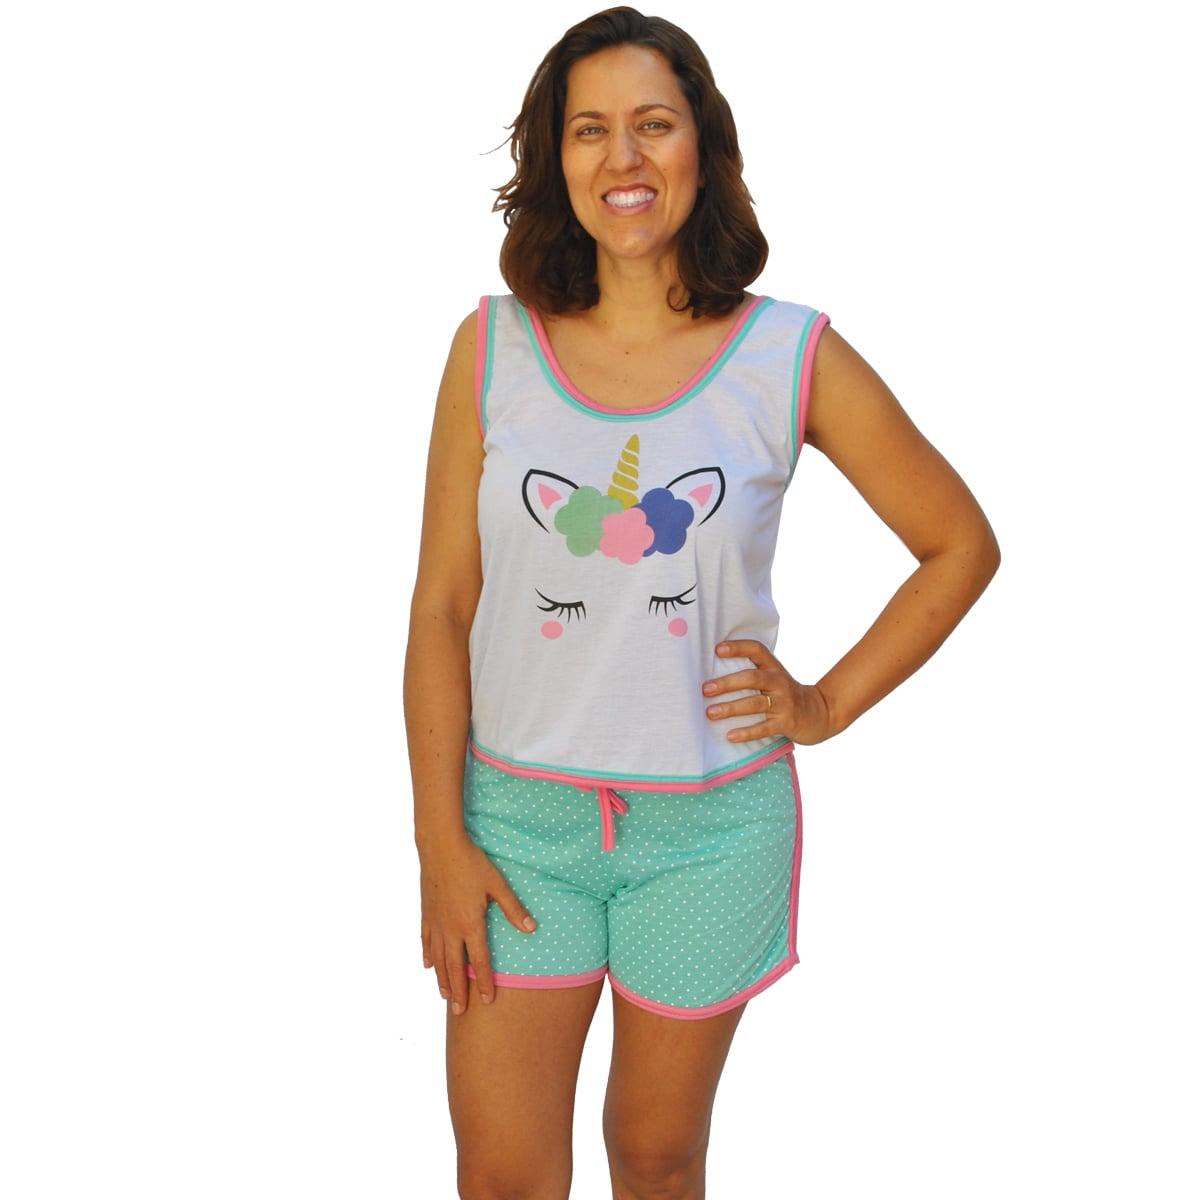 Baby Doll Short Doll Camiseta Feminino Adulto Unicórnio Minnie Ref: 027